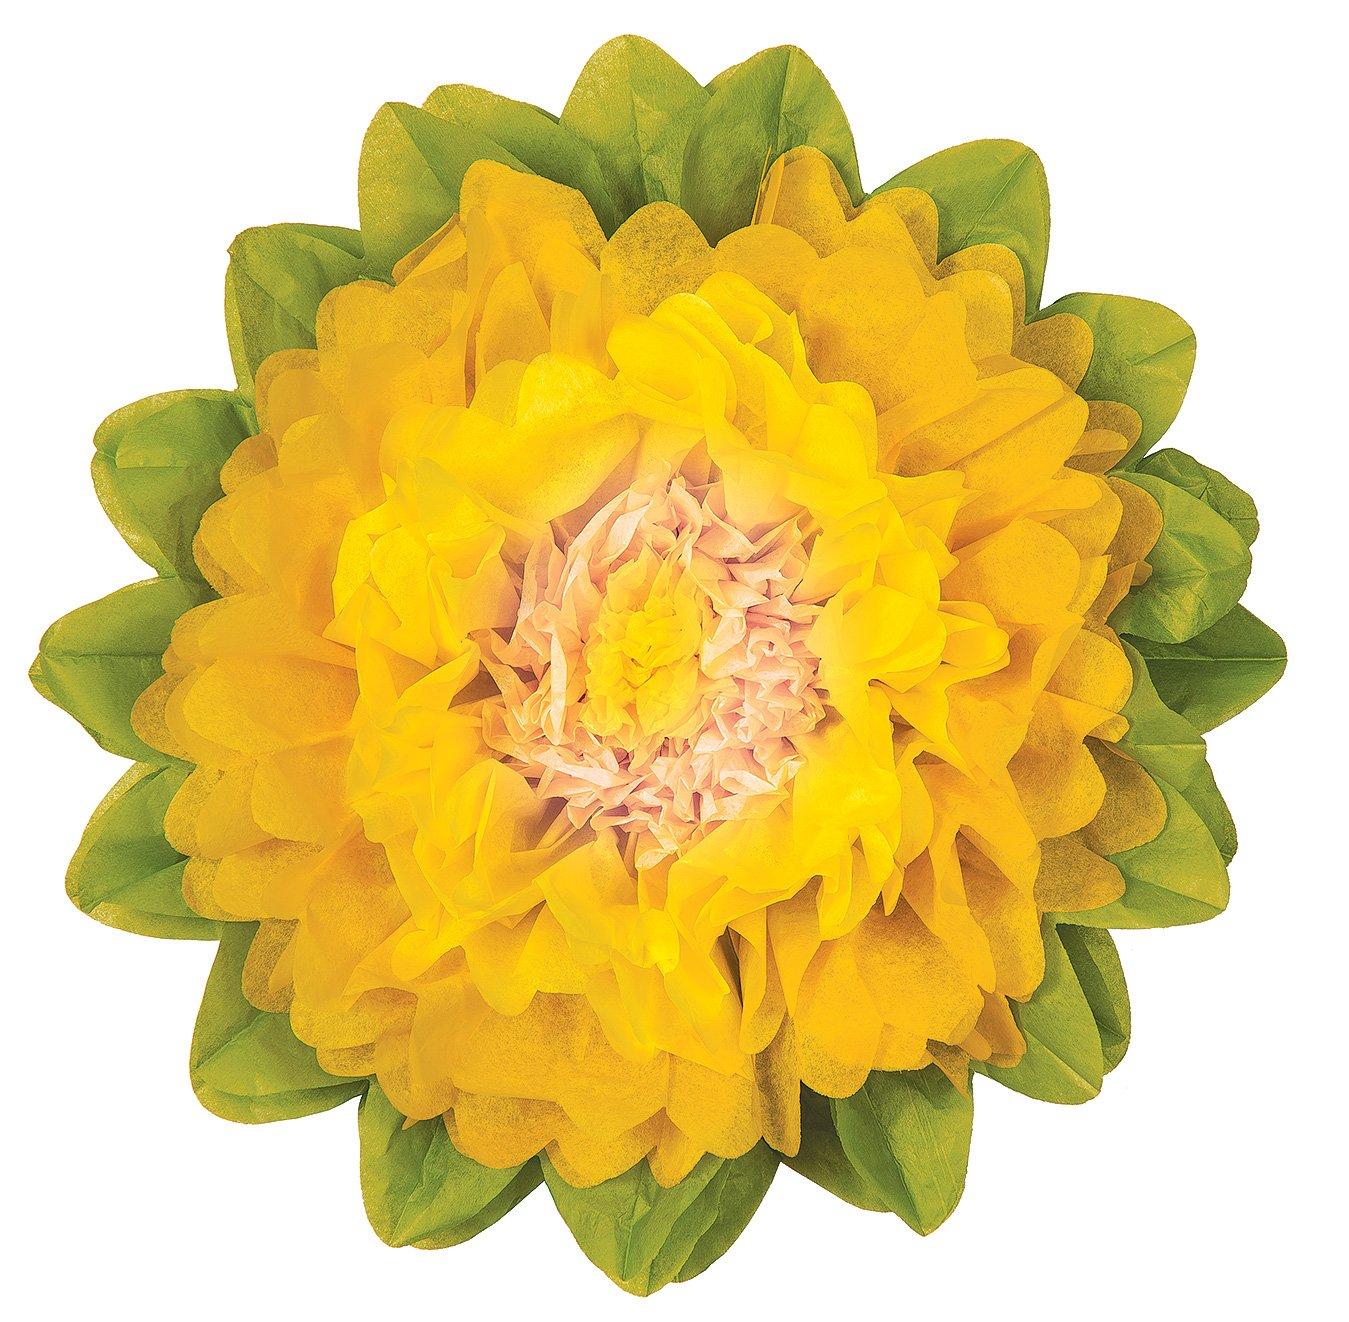 Amazon Luna Bazaar Giant Tissue Paper Flower 24 Inch Yellow